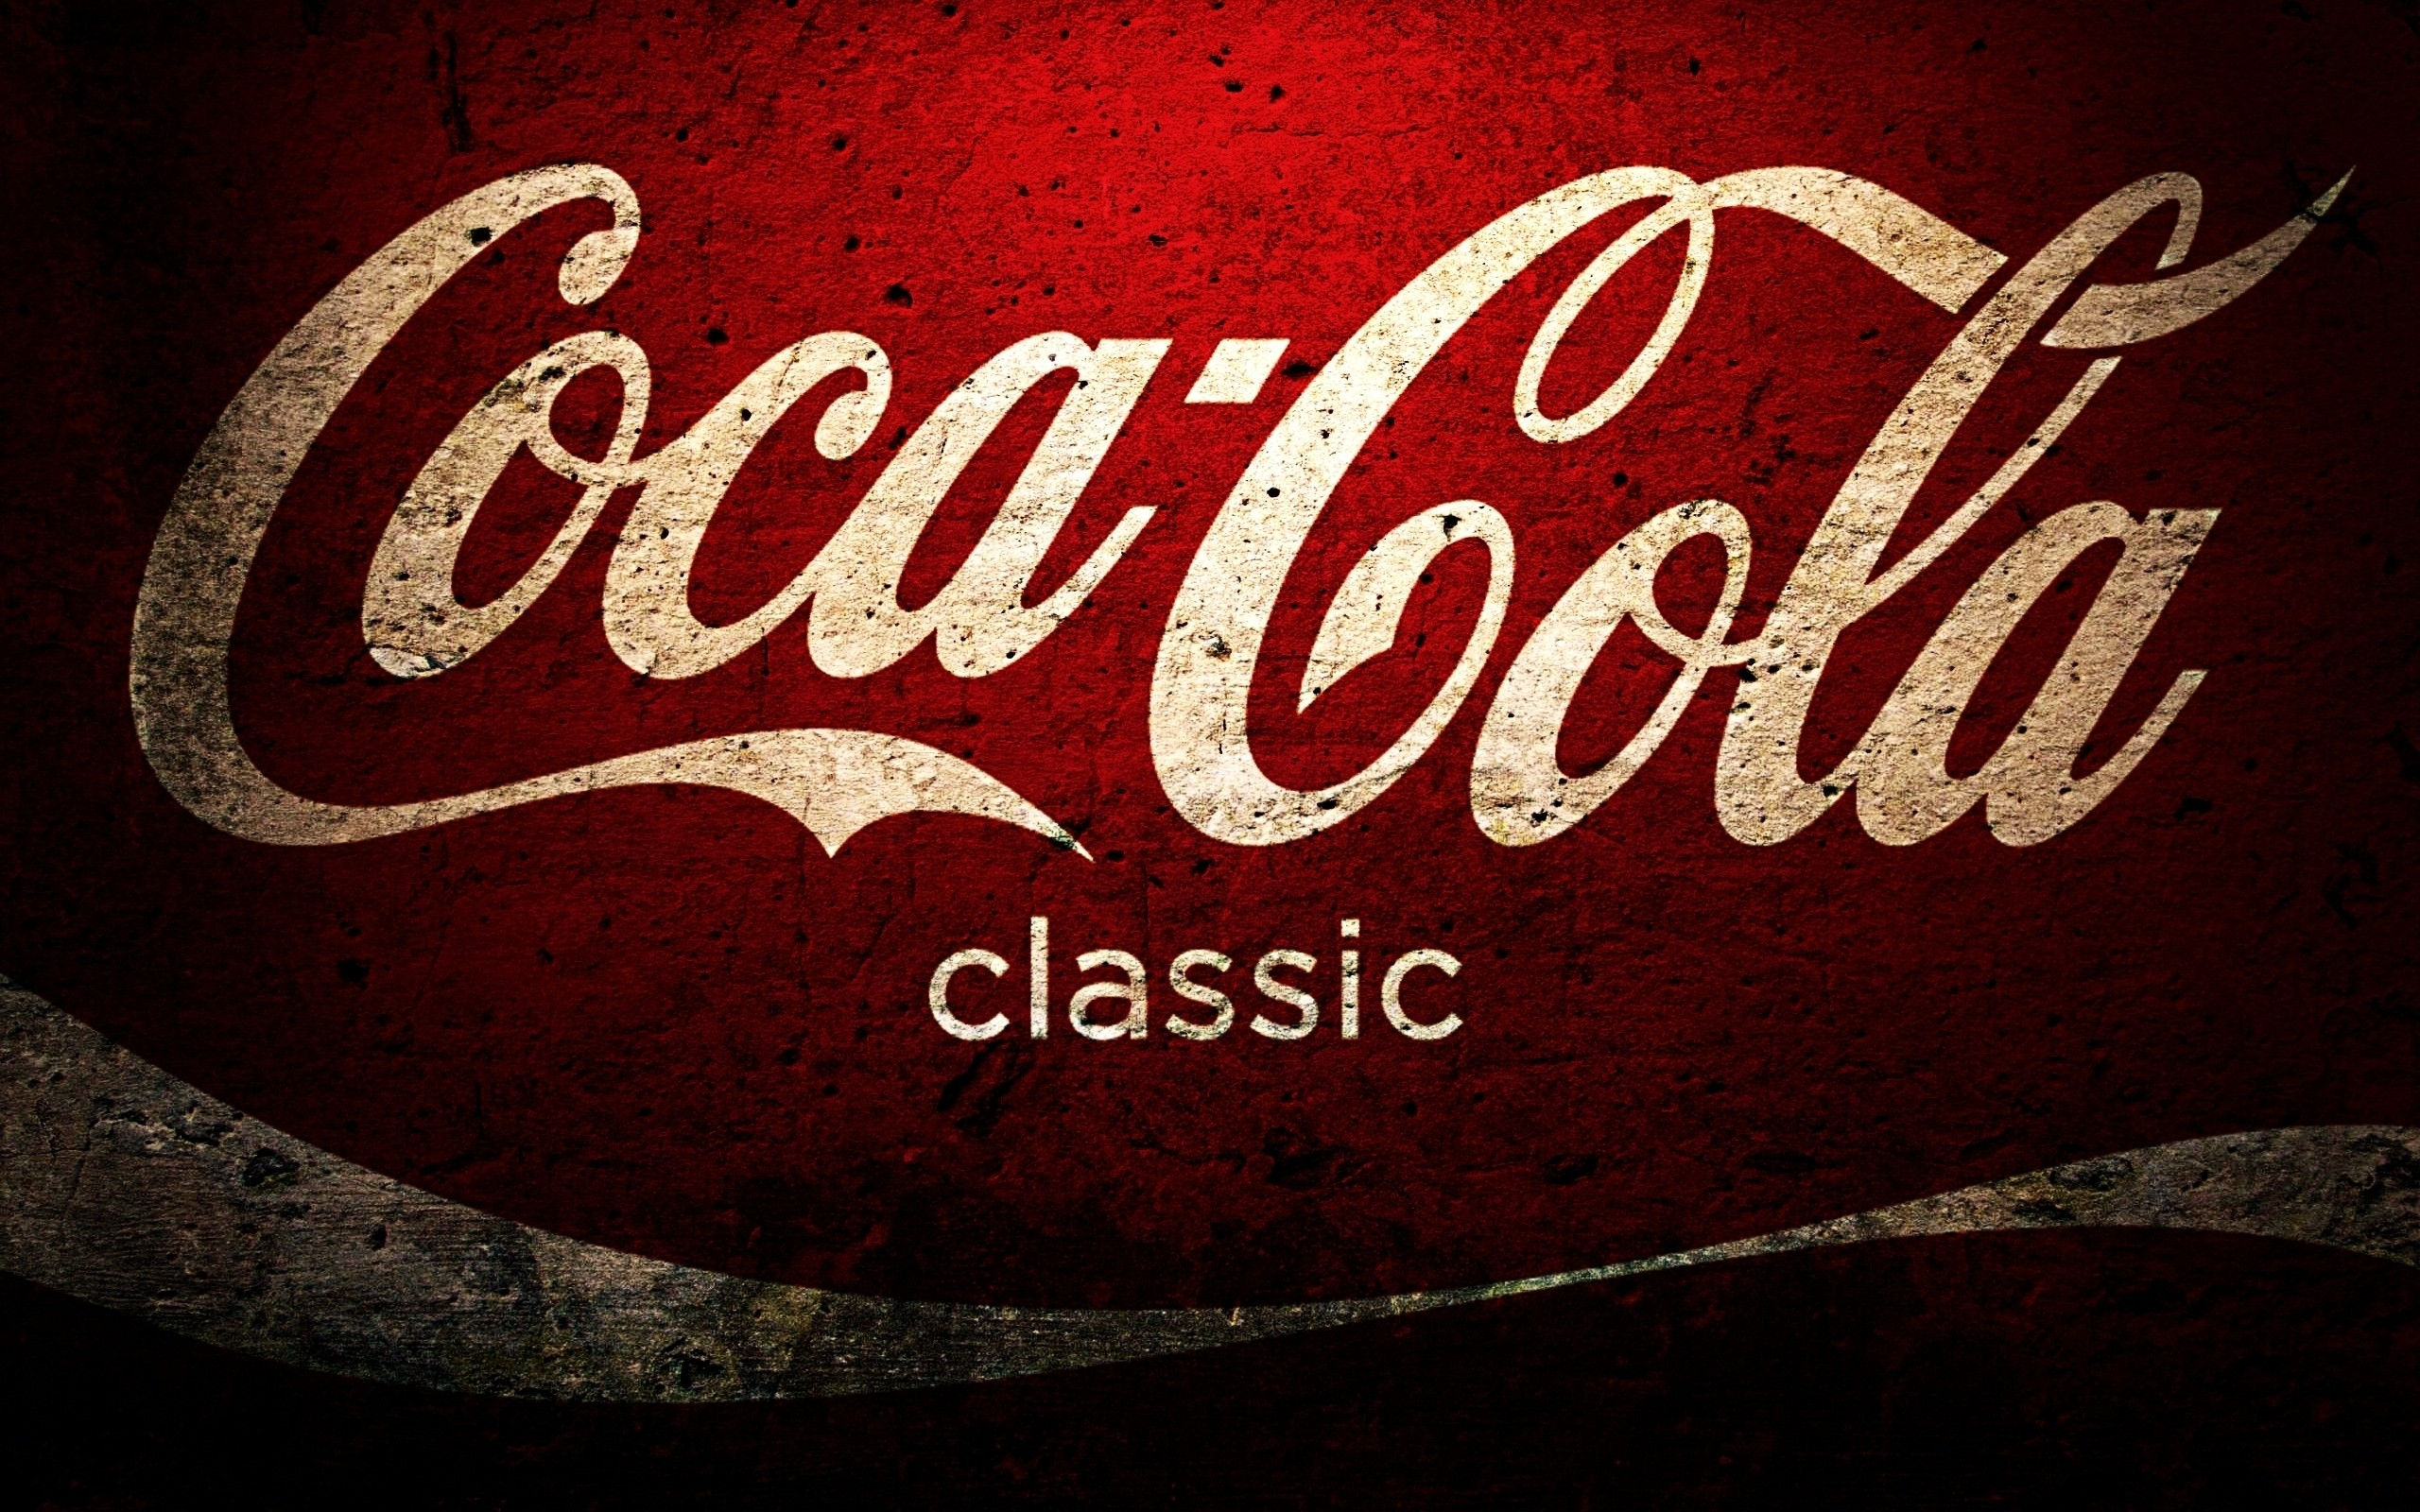 Coca Cola Hd Wallpaper Background Image 2560x1600 Id